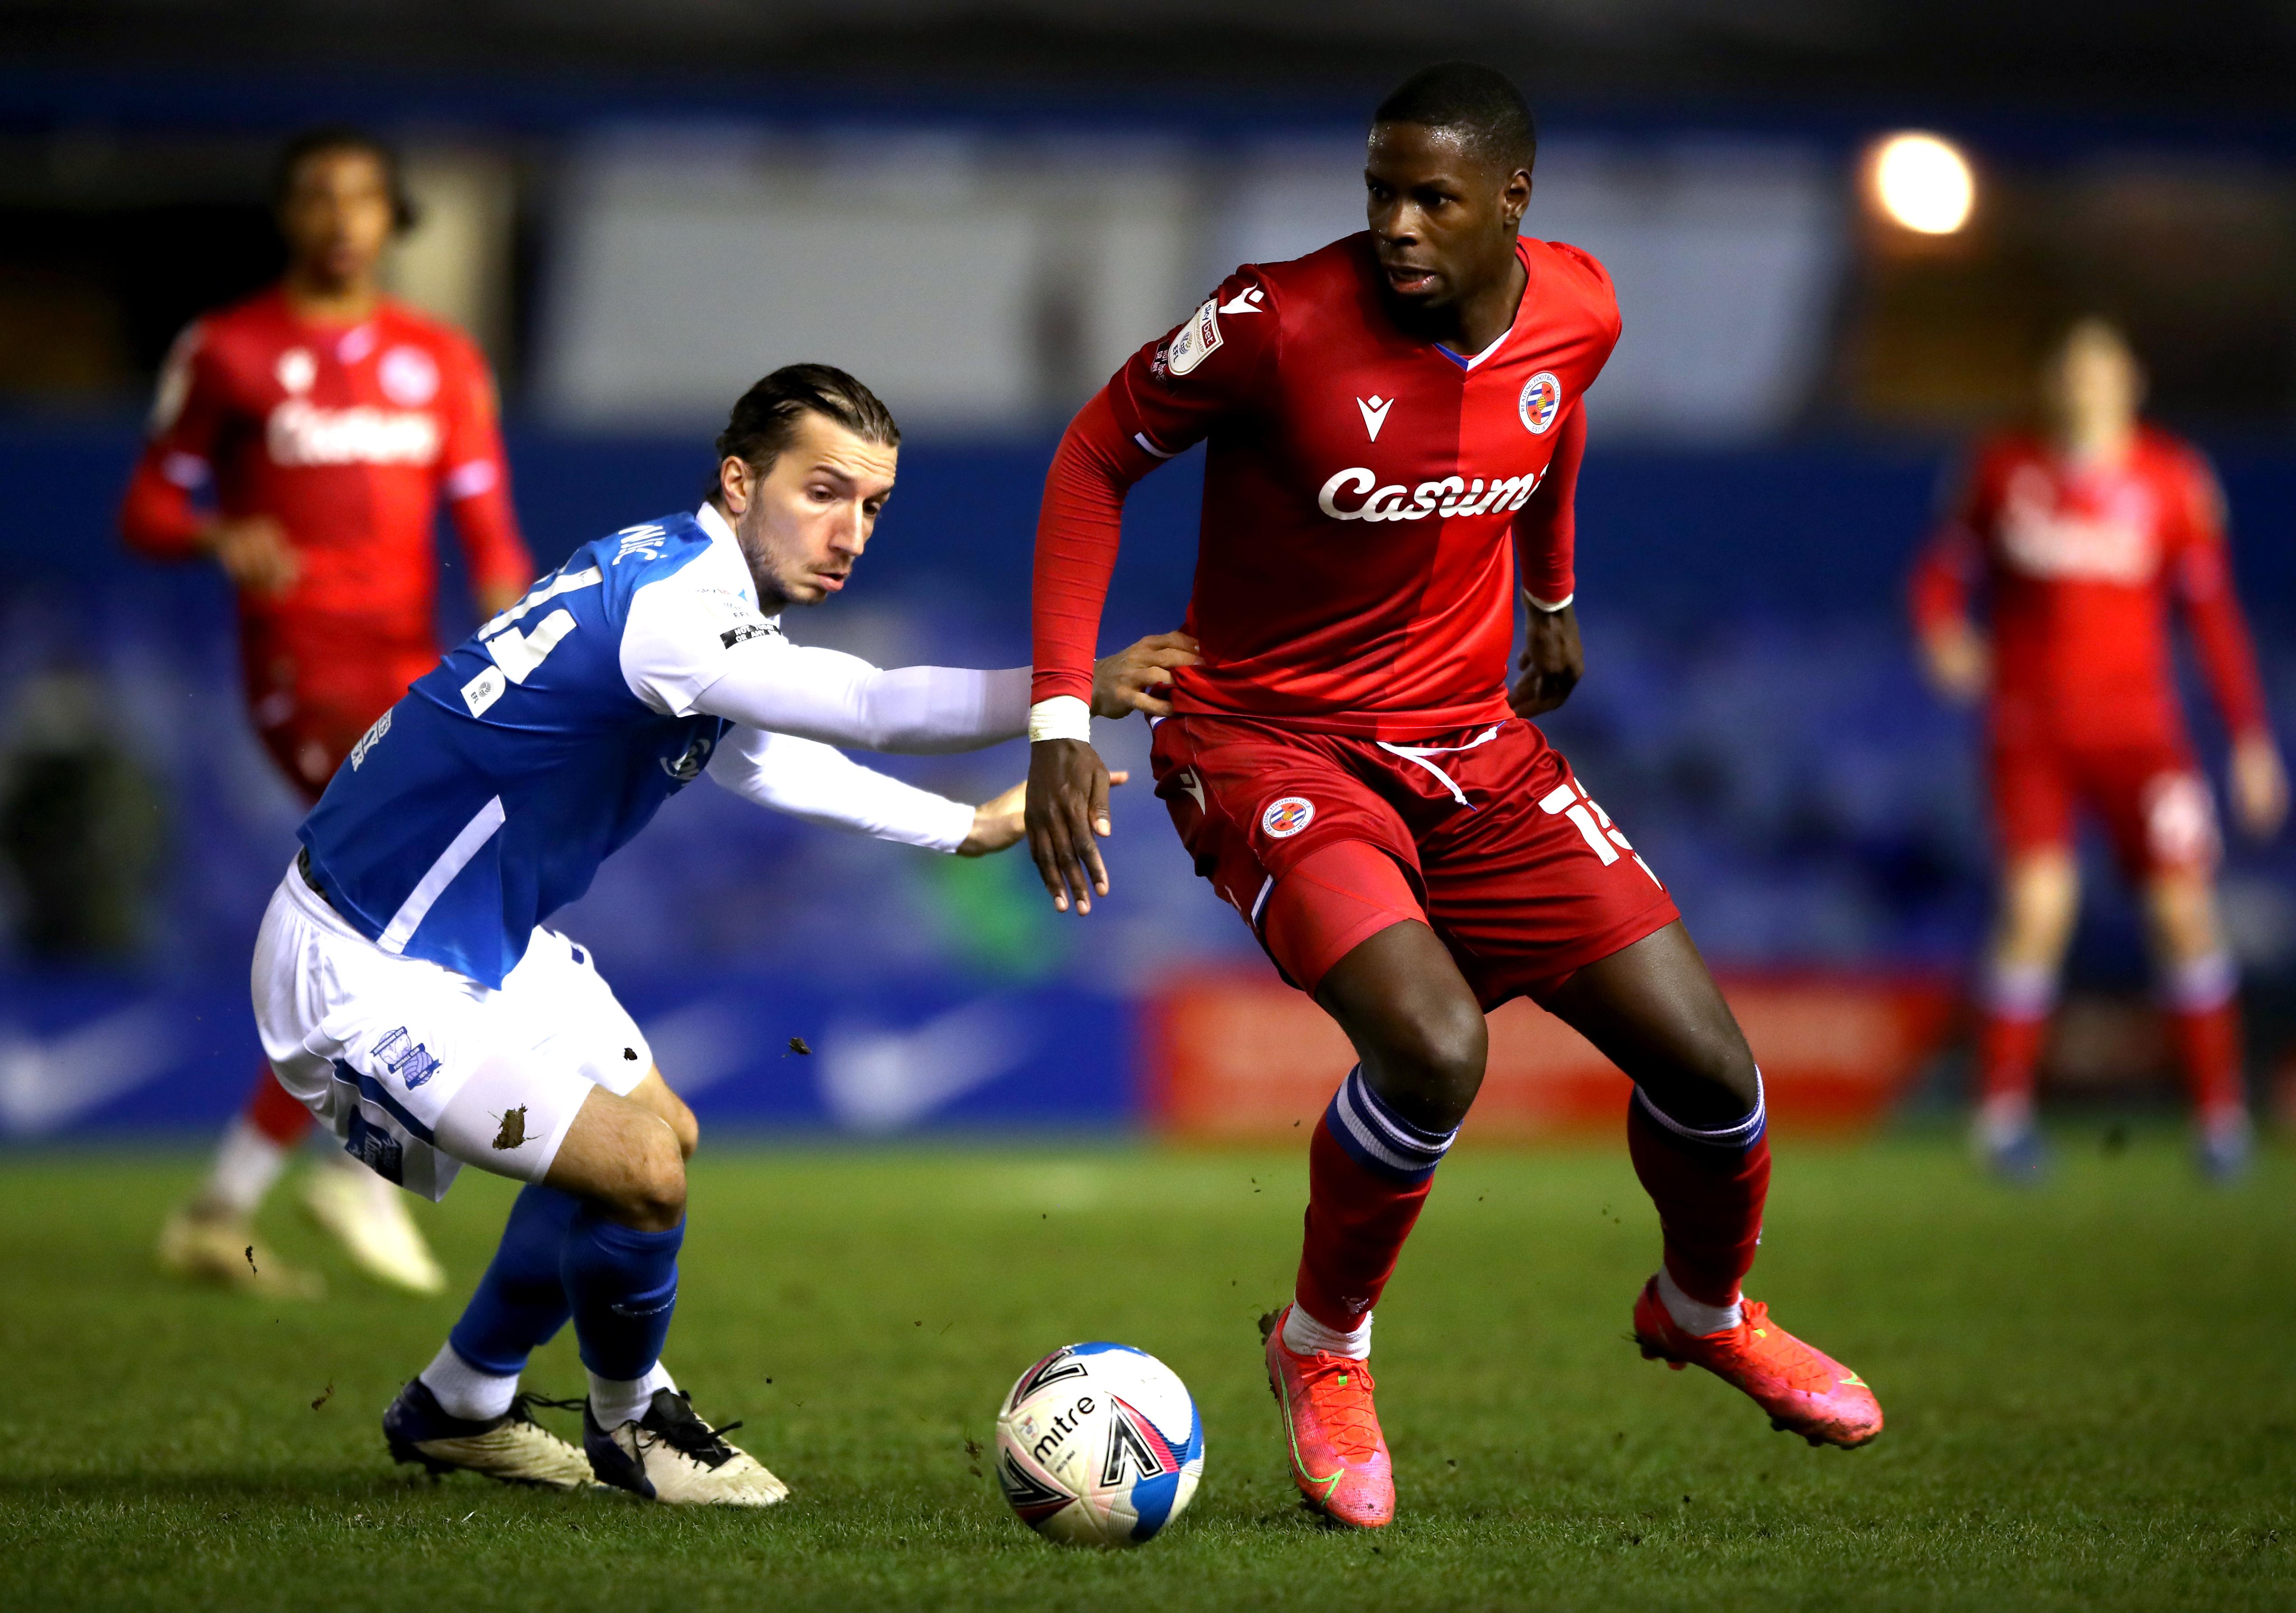 Birmingham City v Reading - Sky Bet Championship - St Andrew's Trillion Trophy Stadium